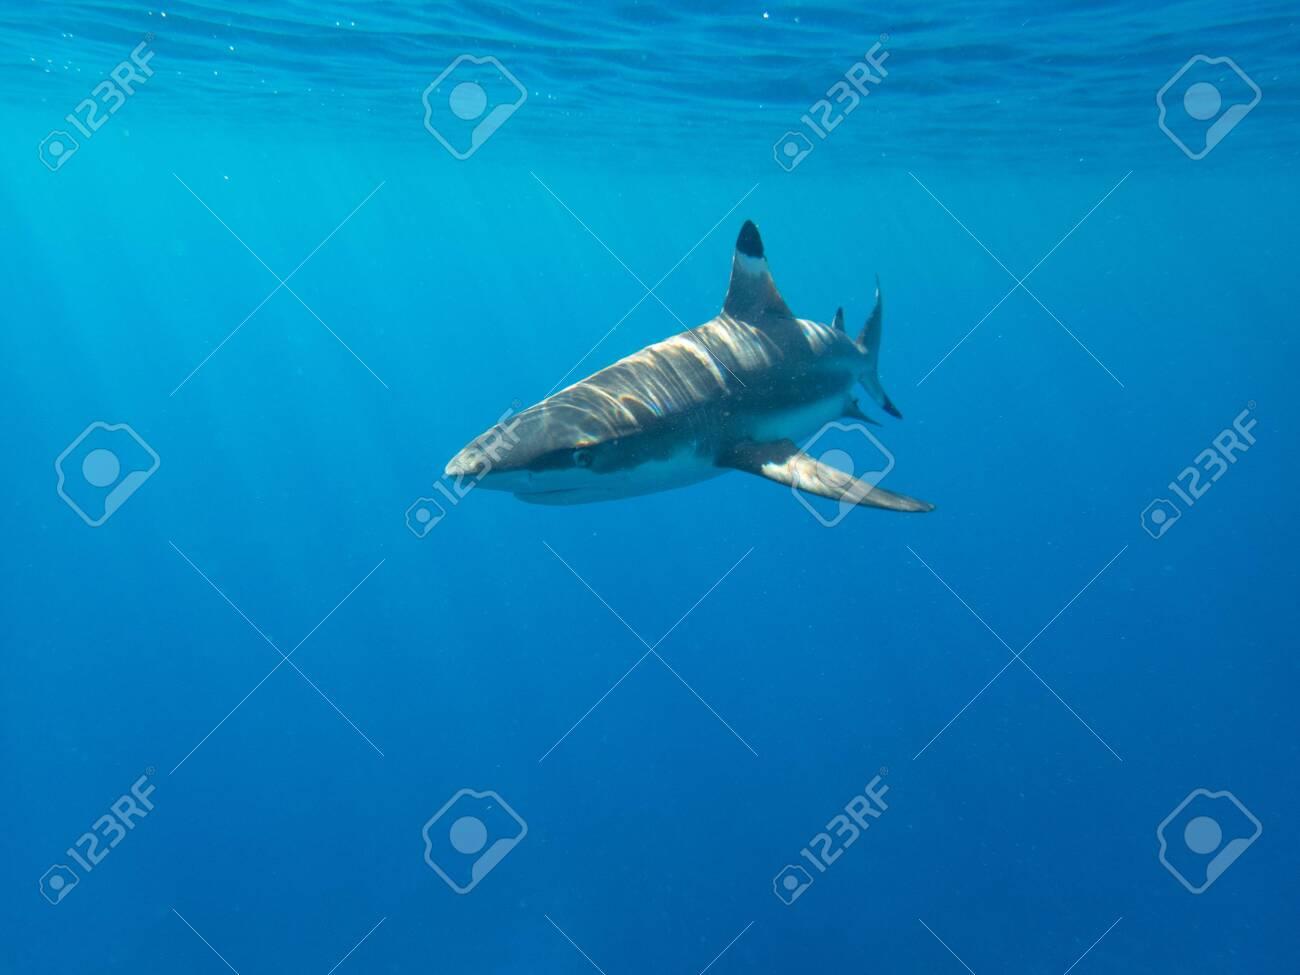 Blacktip Reef Shark in the lagoon off Moorea, French Polynesia next to Tahiti - 156618542